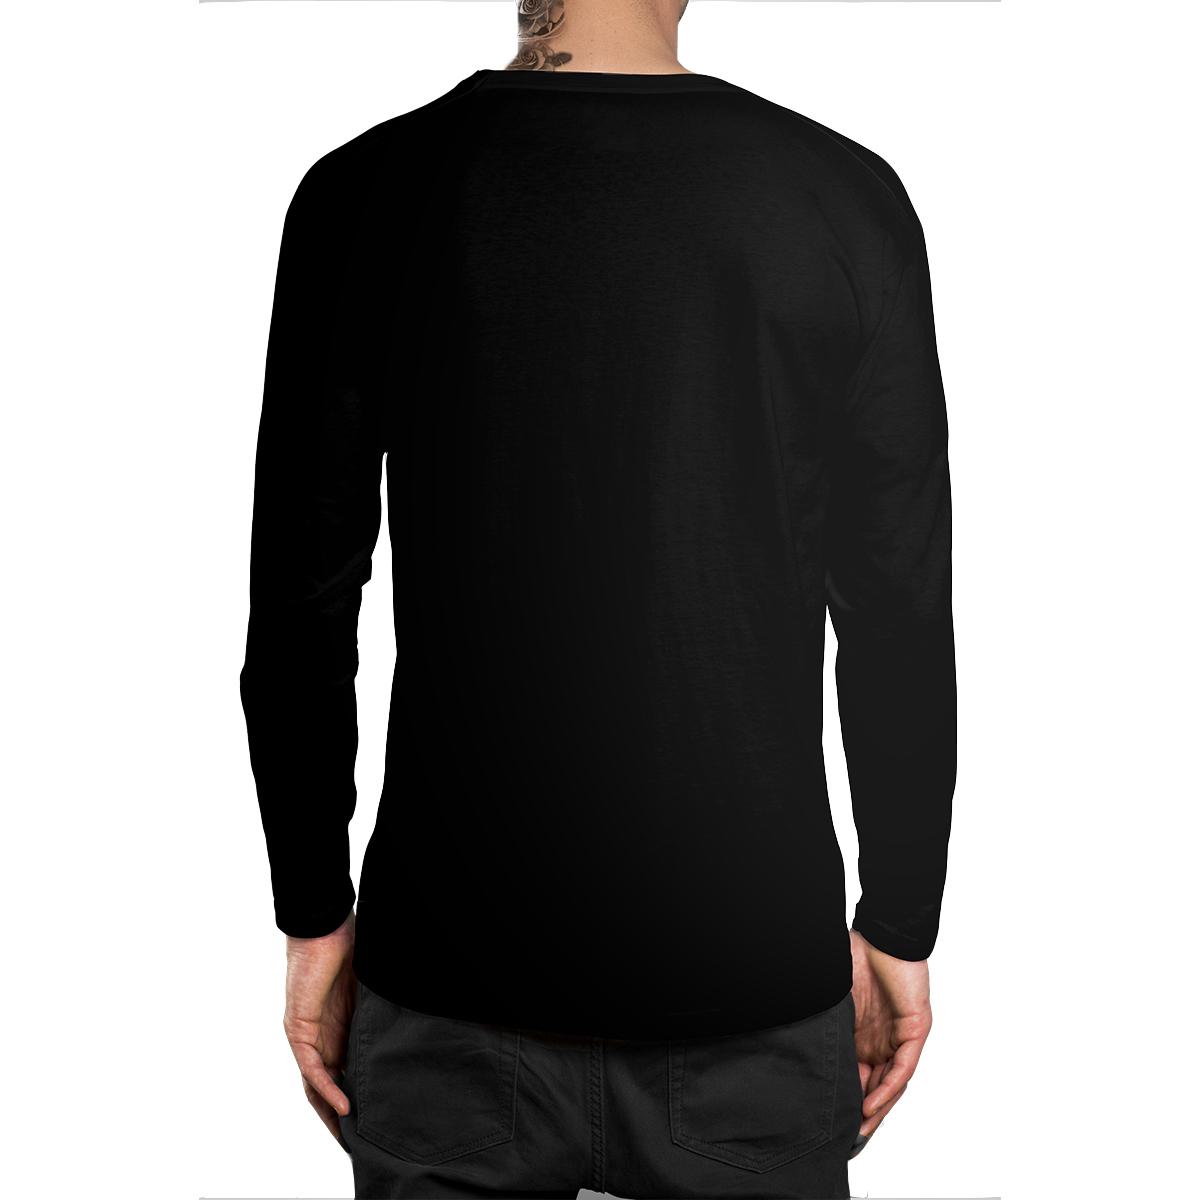 Stompy Camiseta Manga Longa Modelo 04